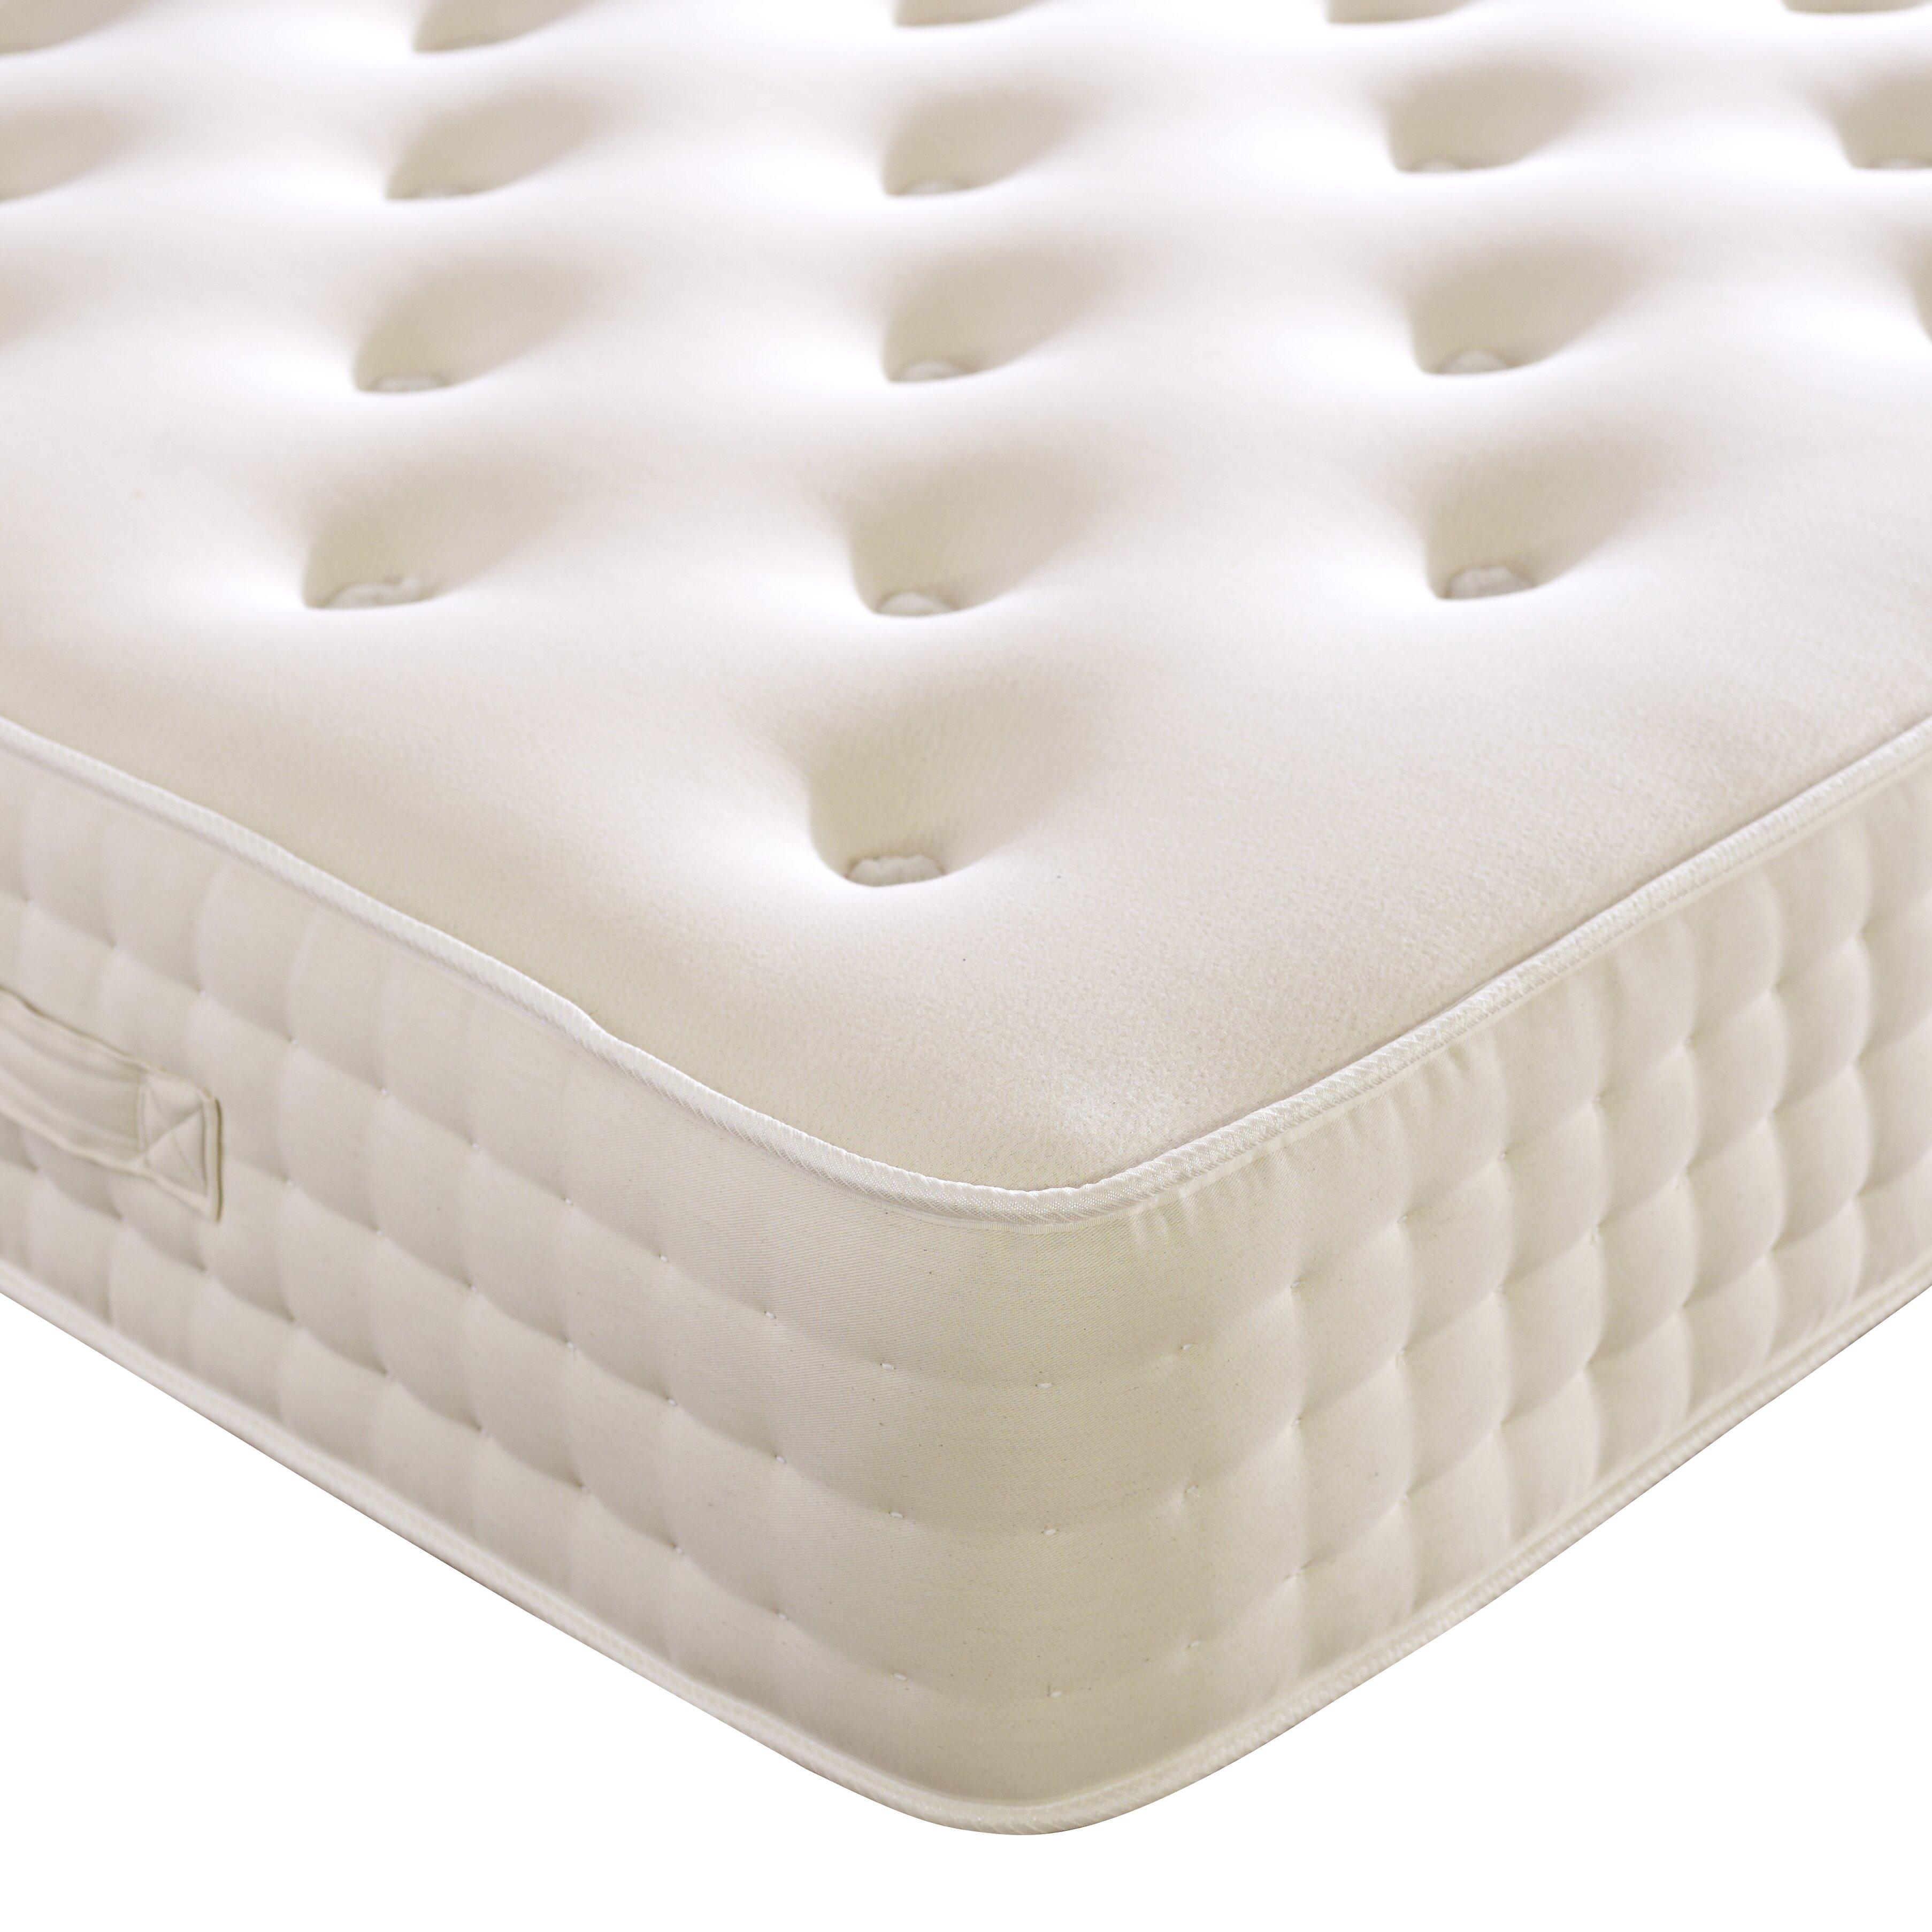 shbe pocket sprung 2000 mattress reviews wayfair uk. Black Bedroom Furniture Sets. Home Design Ideas